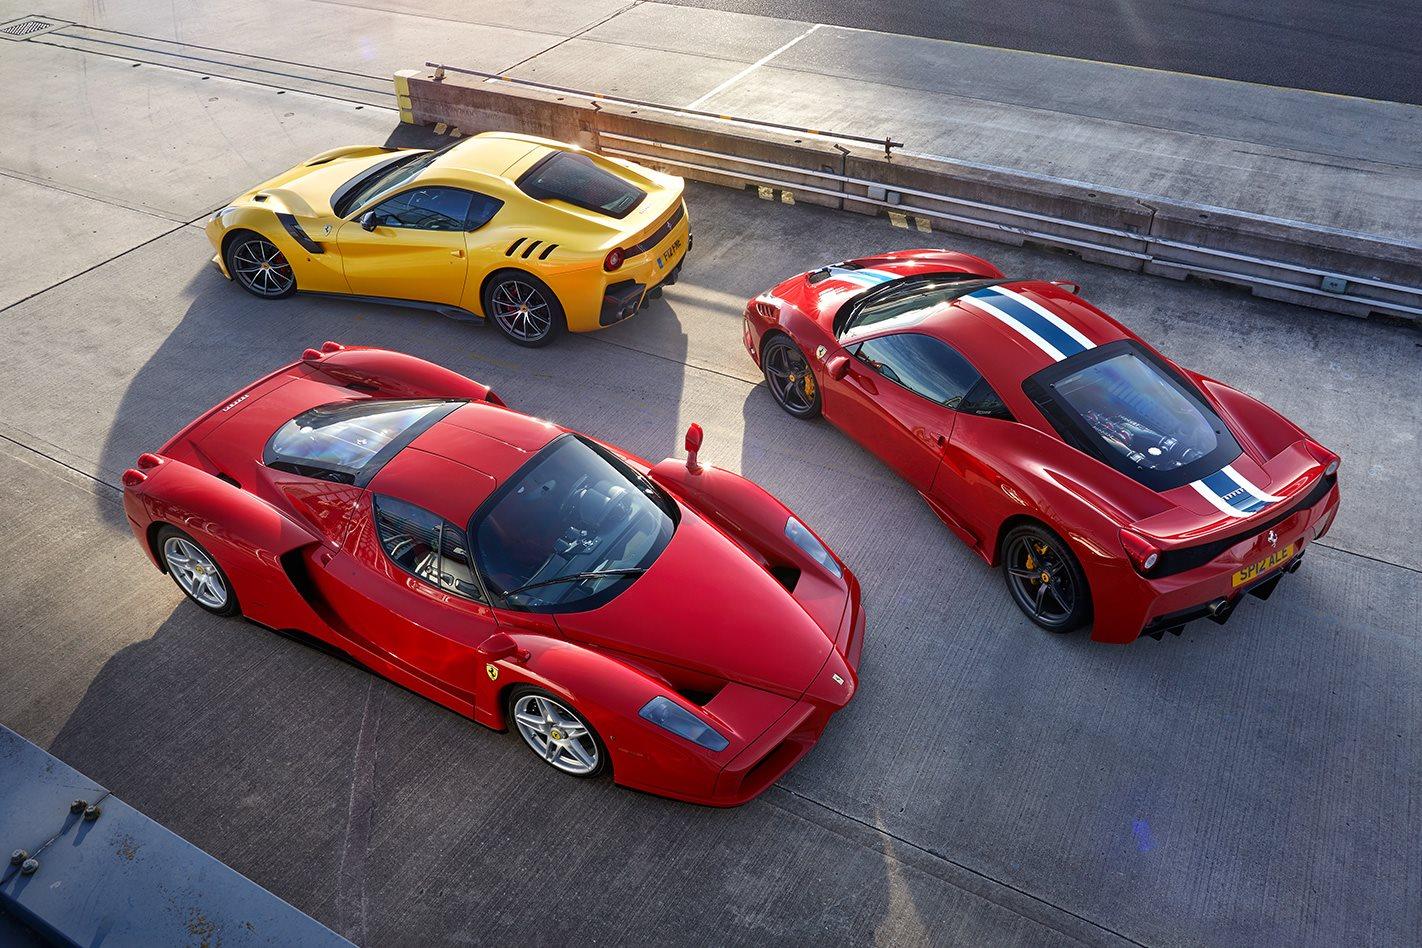 Ferrari Enzo V Ferrari F12 Tdf V Ferrari 458 Speciale Driven